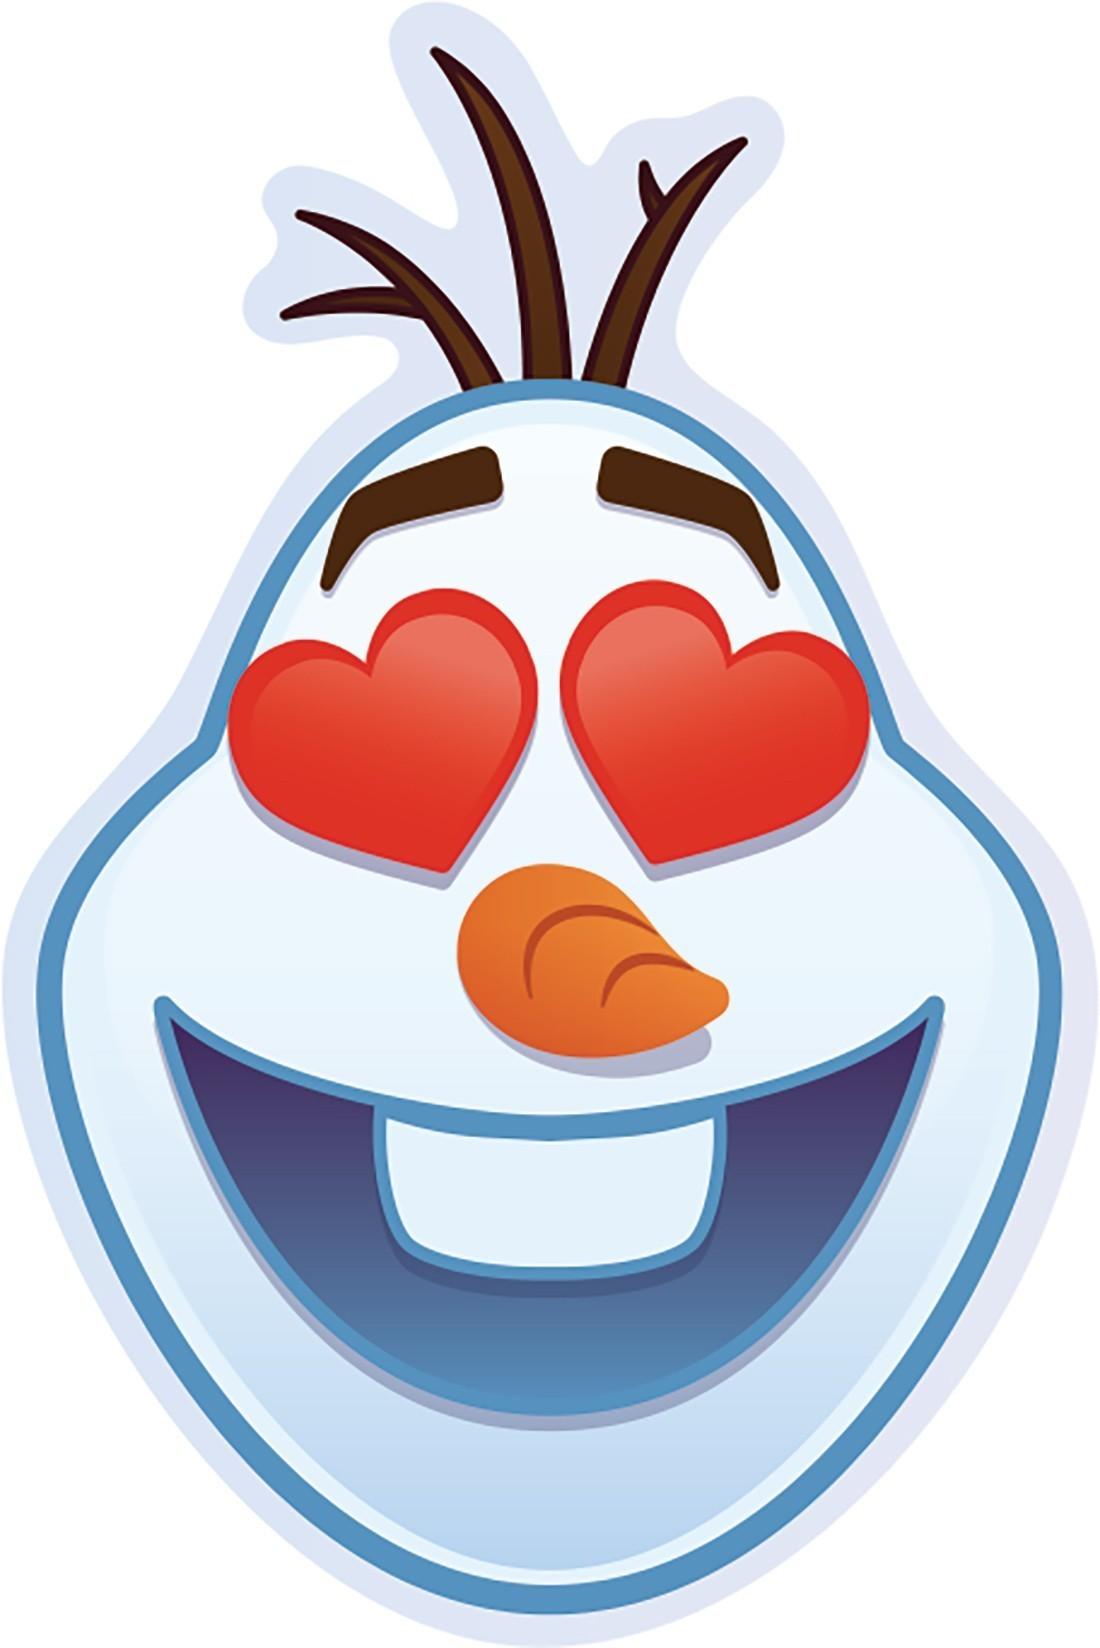 Disney Frozen Emoji Shaped Stickers [image]